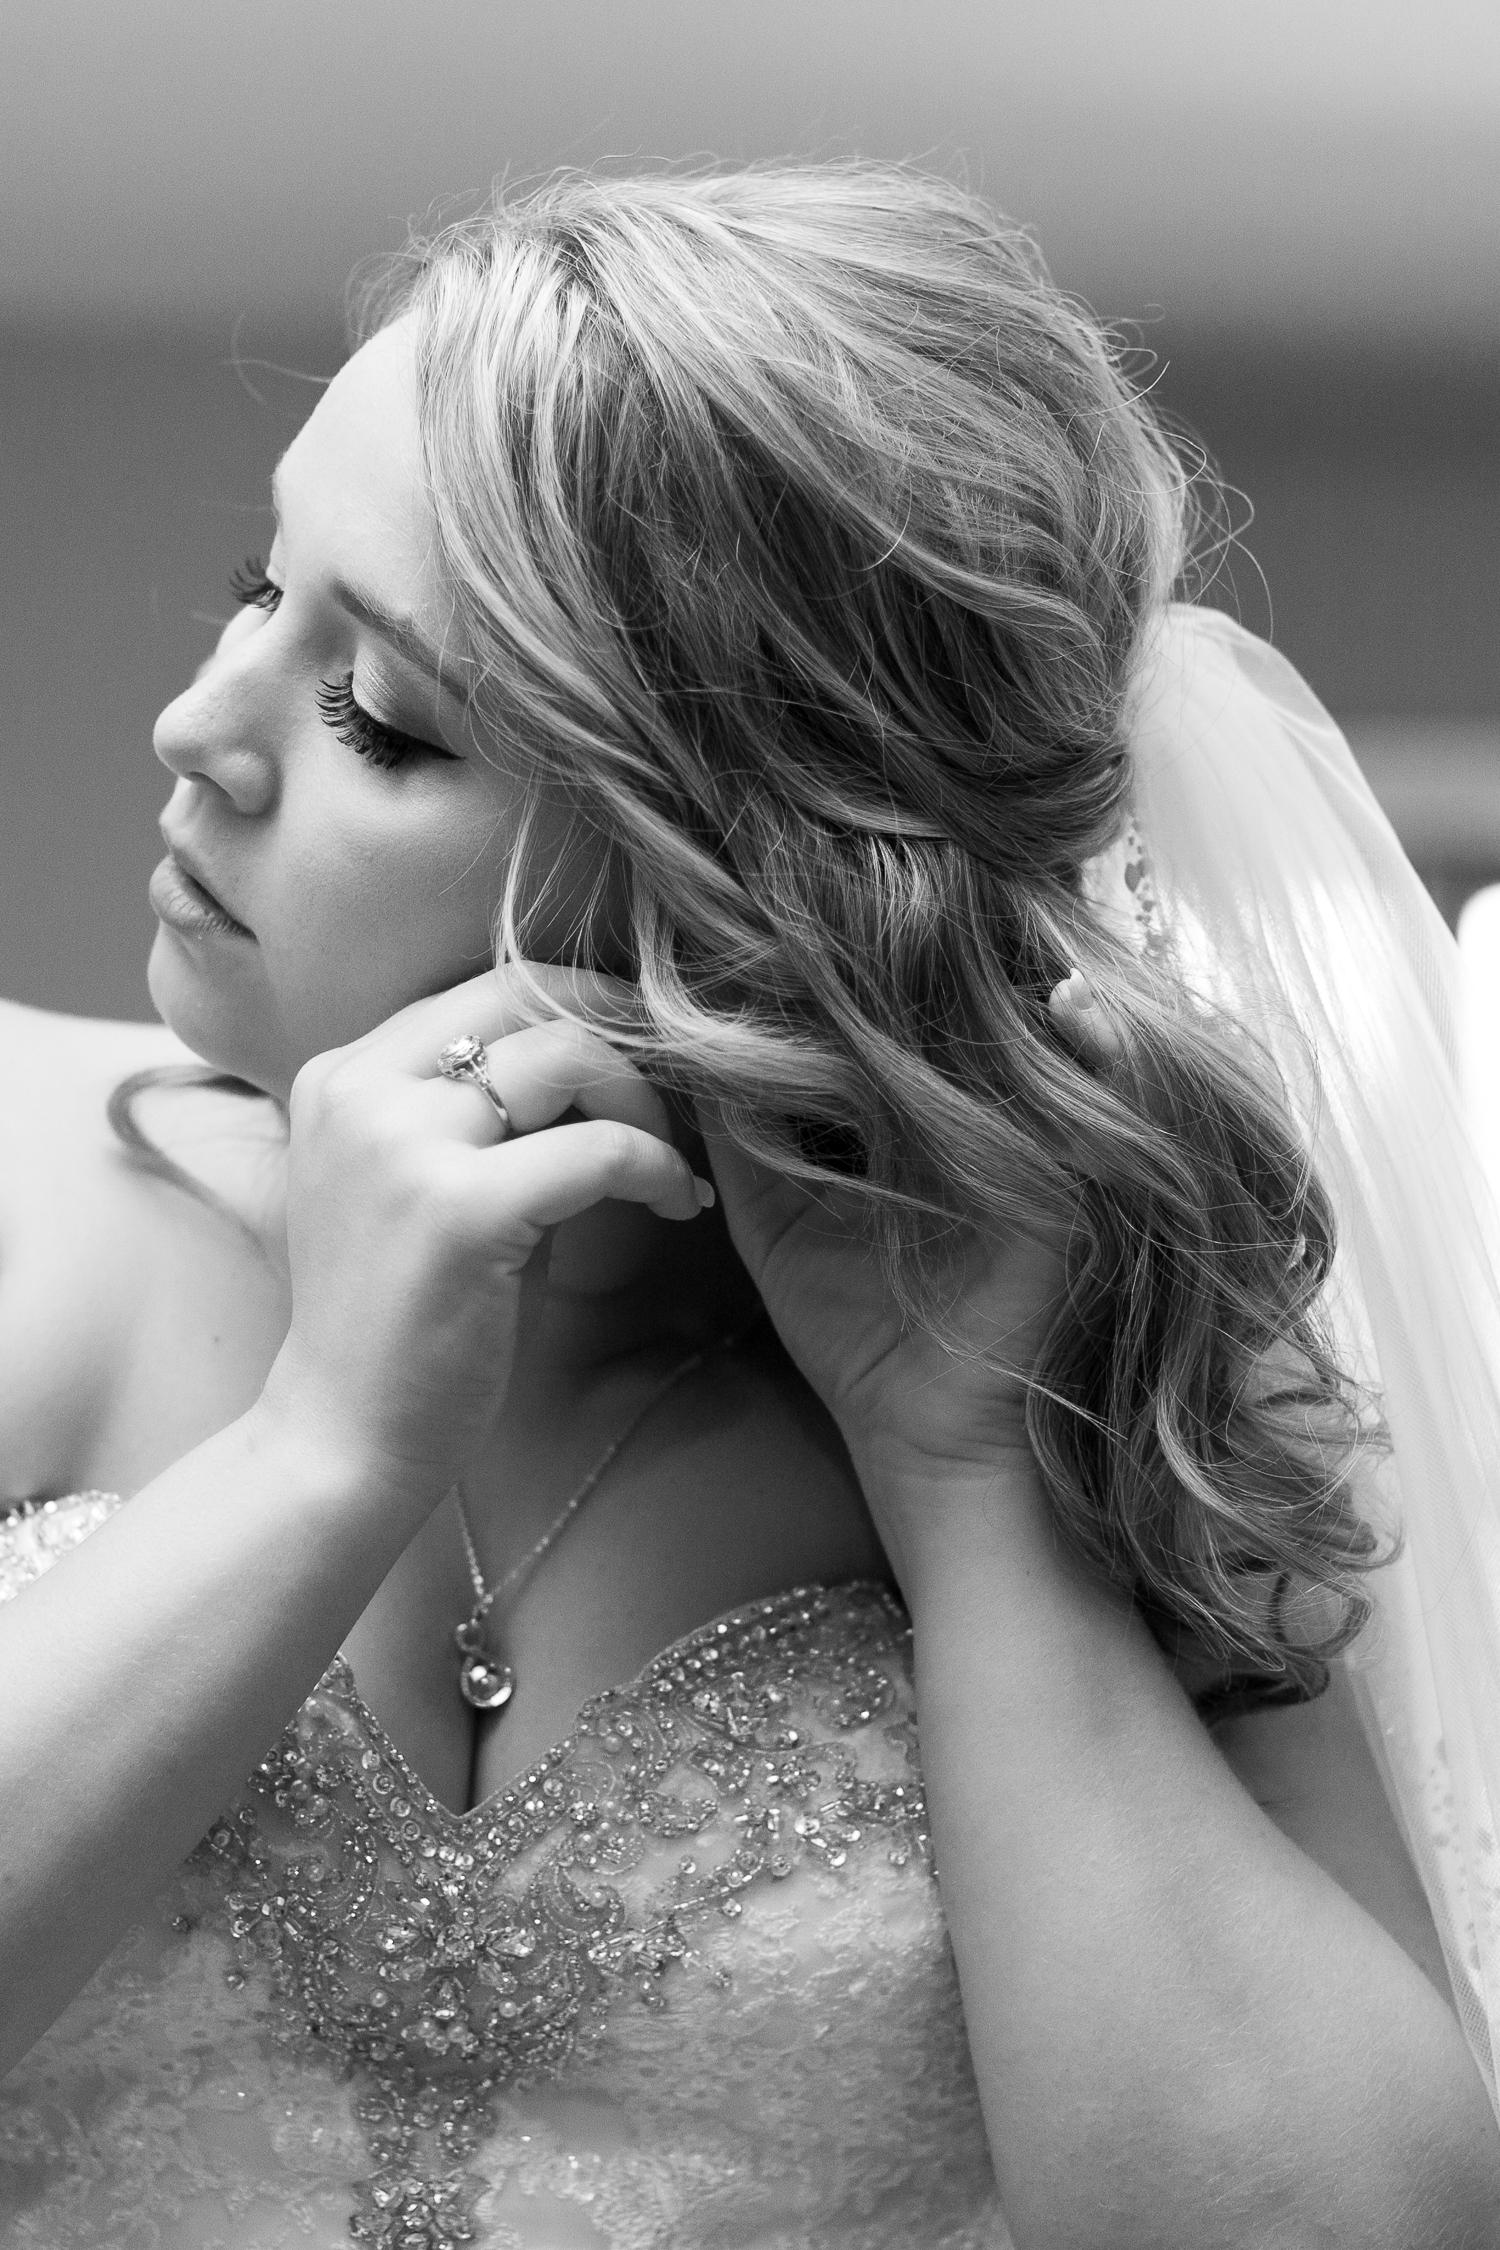 Morgan and Andrew Wedding  - | Anthem Photography | wwww.anthem-photo.com | 001-2.jpg